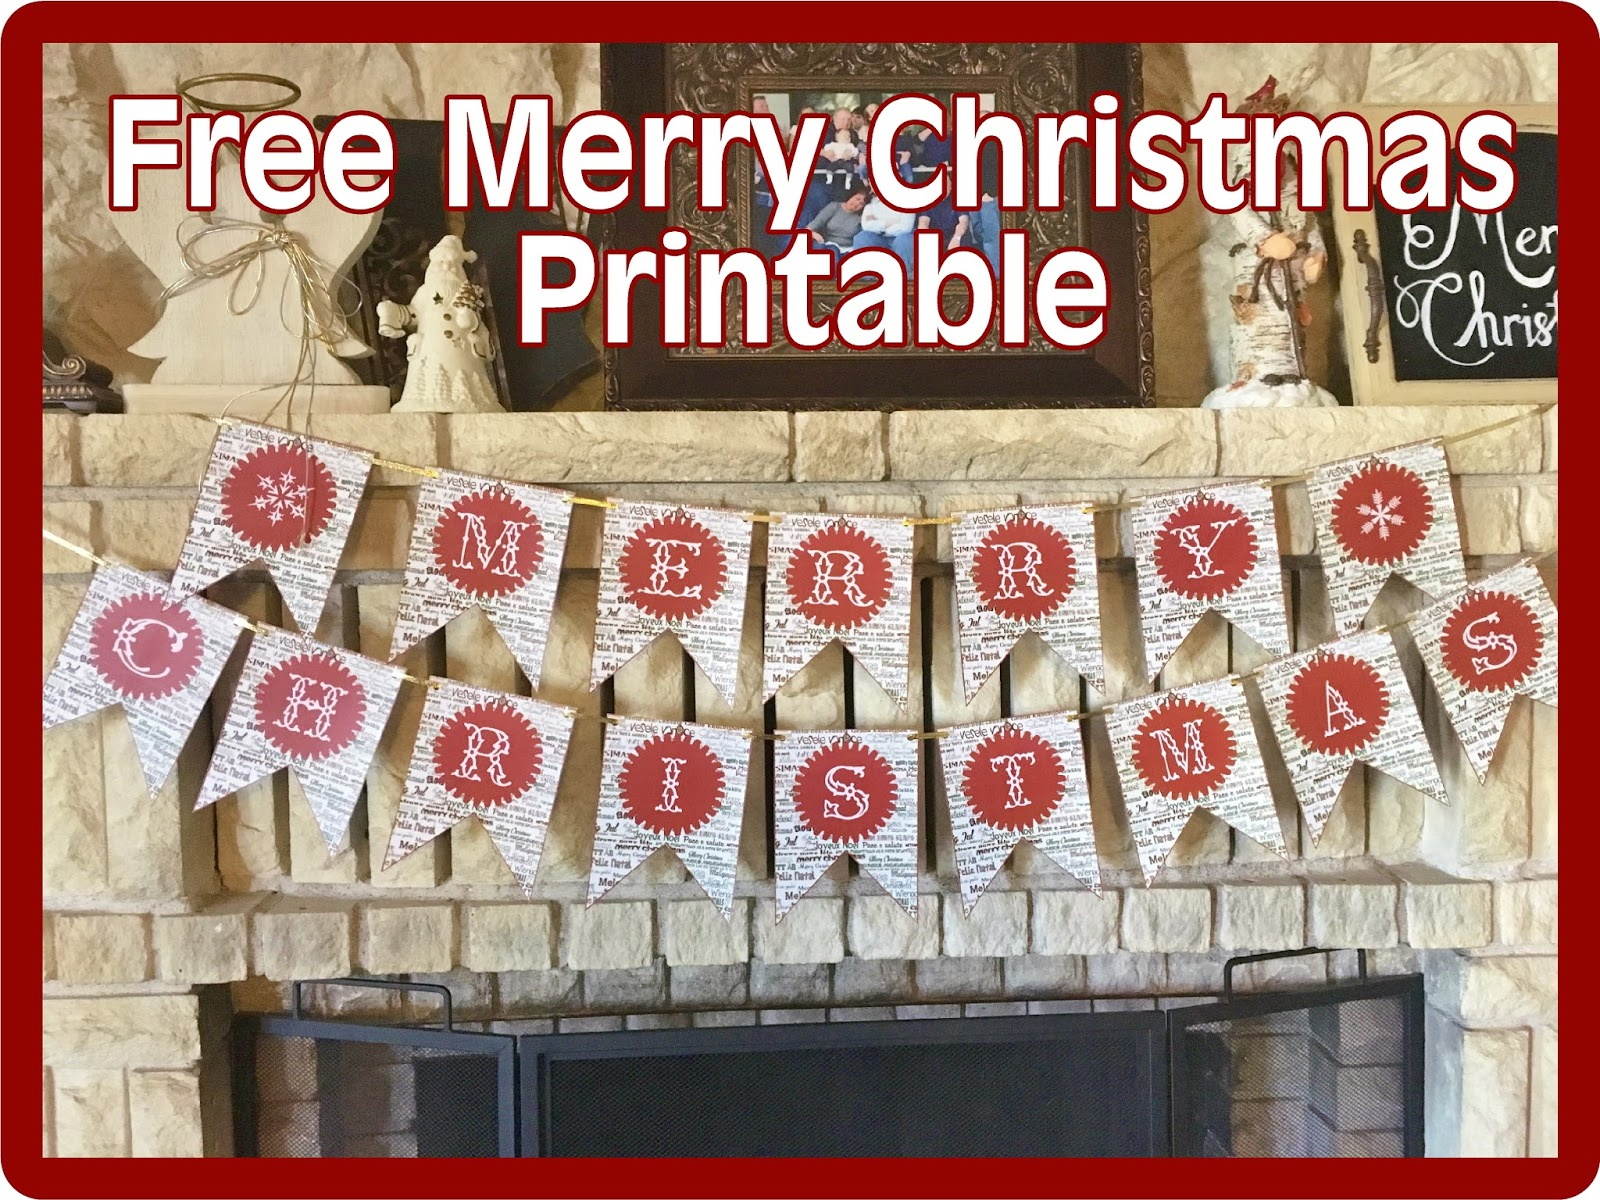 Hollyshome Family Life Free Merry Christmas Banner